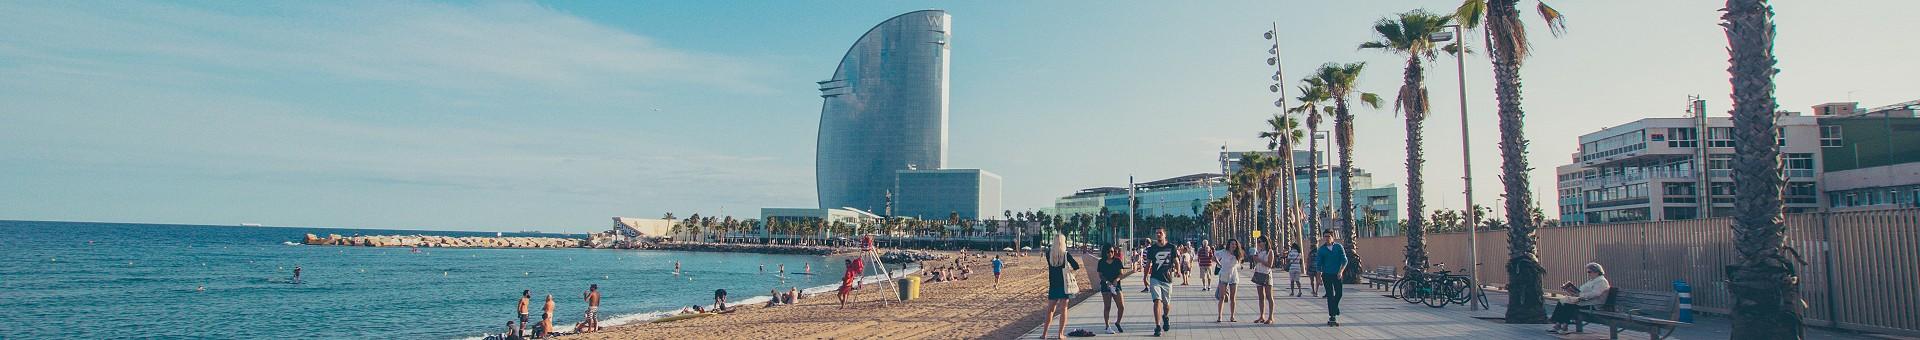 Barcelona | Part I